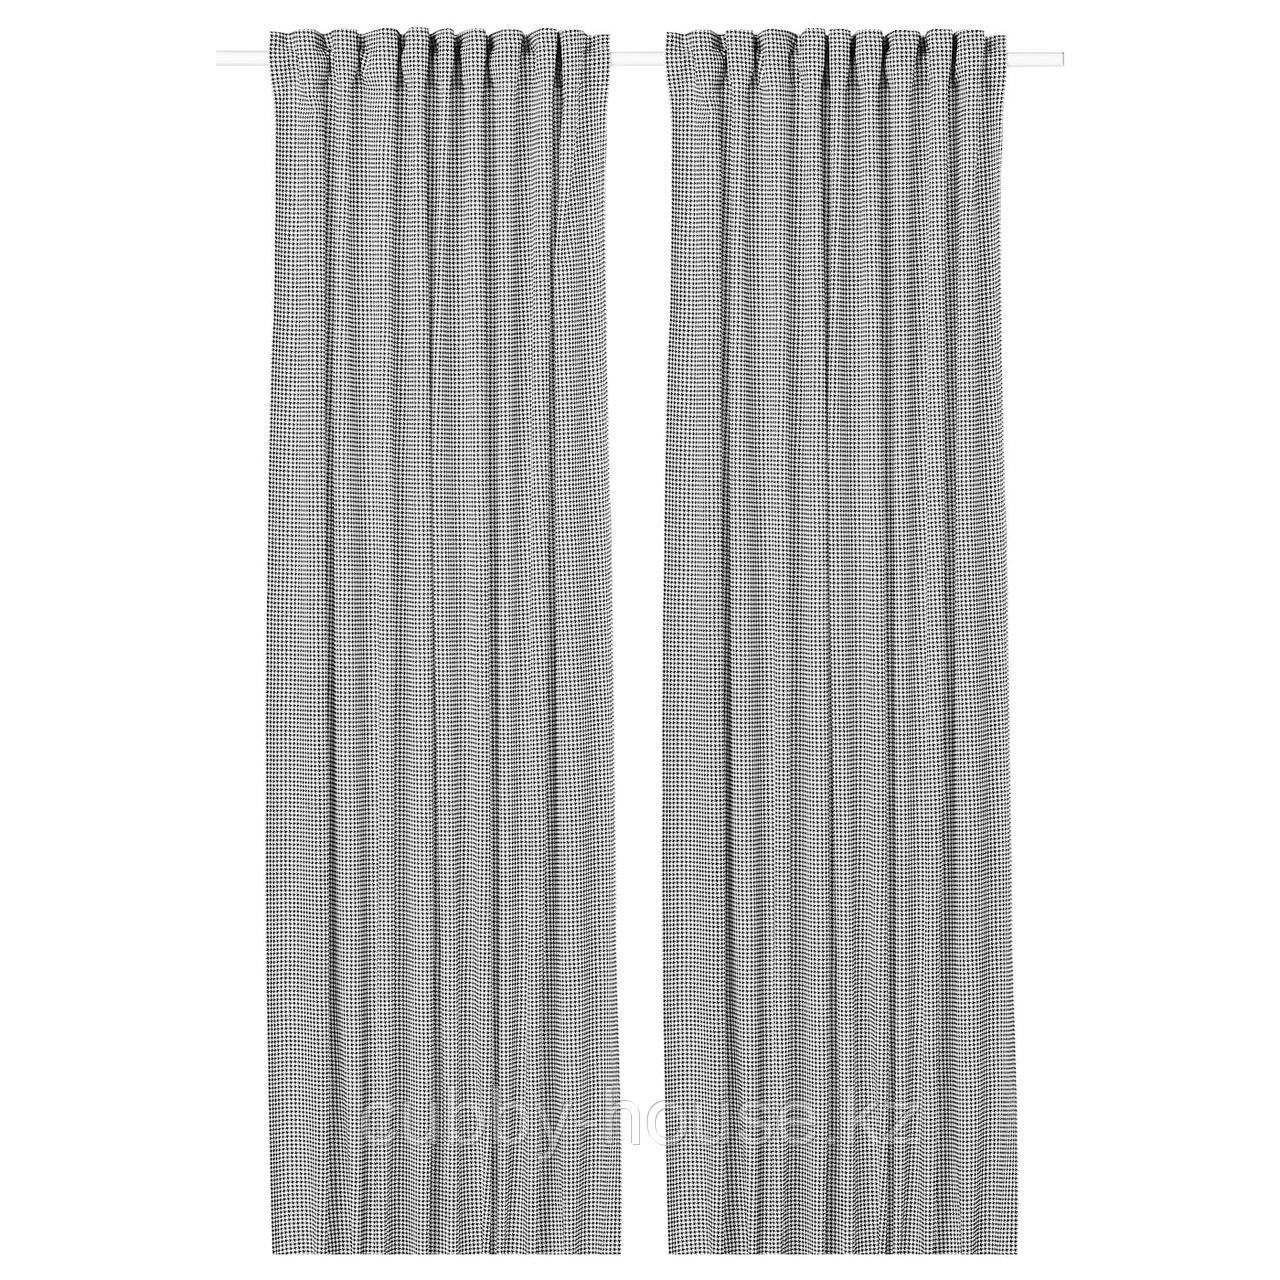 ОРДЕНСФЛИ Гардины, 1 пара, белый/темно-серый, 145x300 см